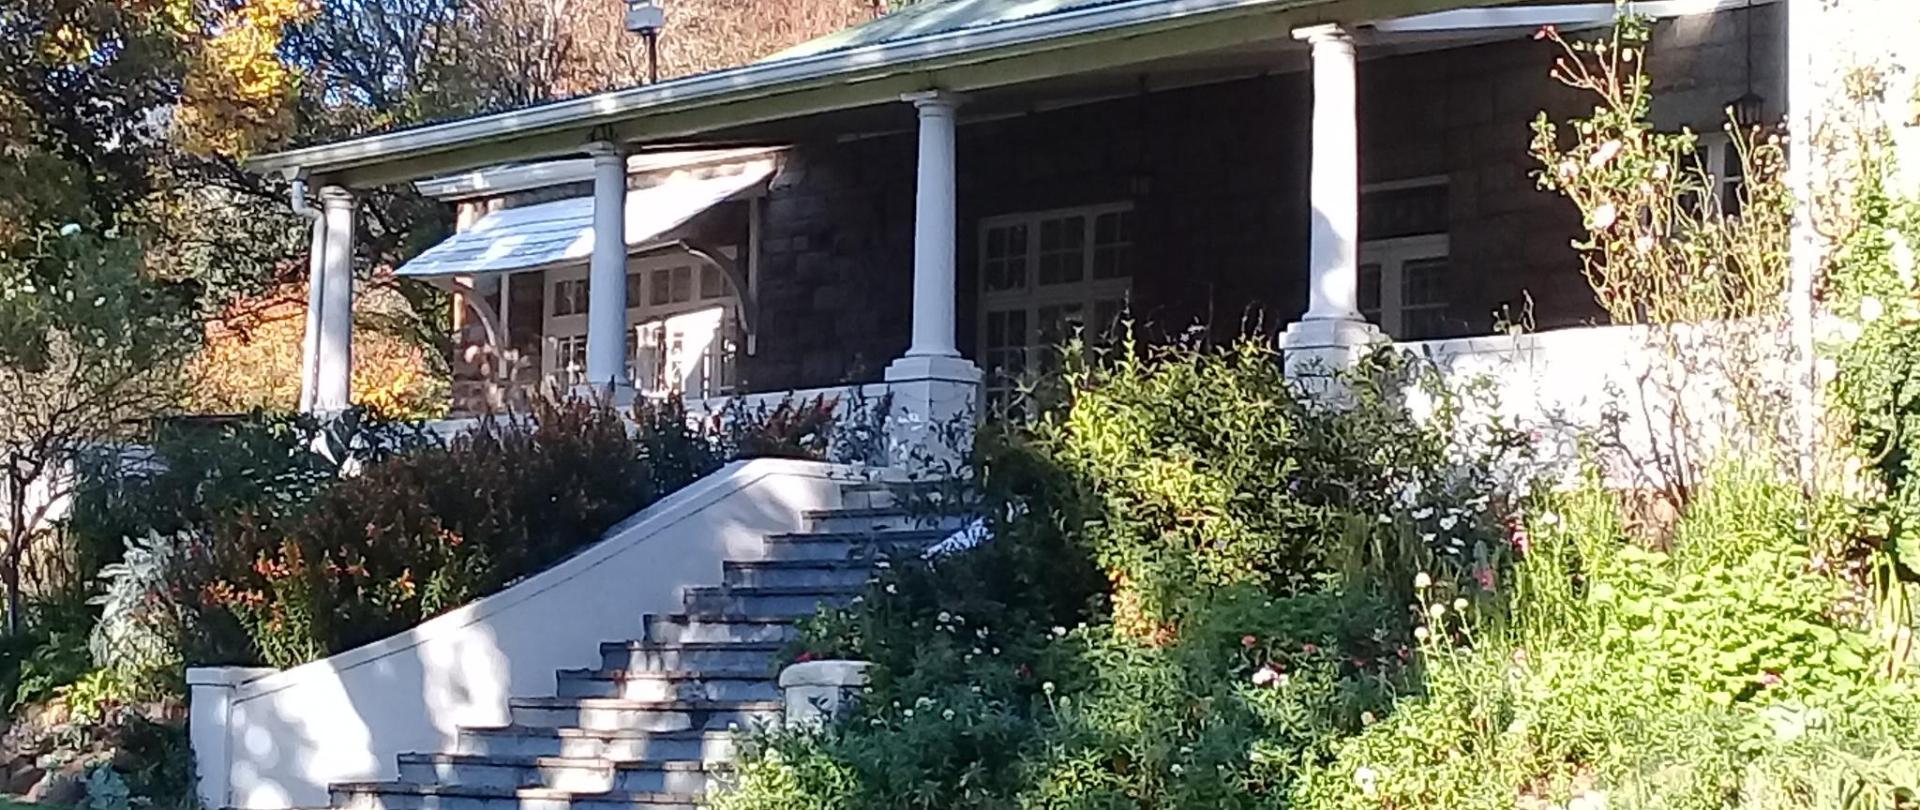 House at Glengariff